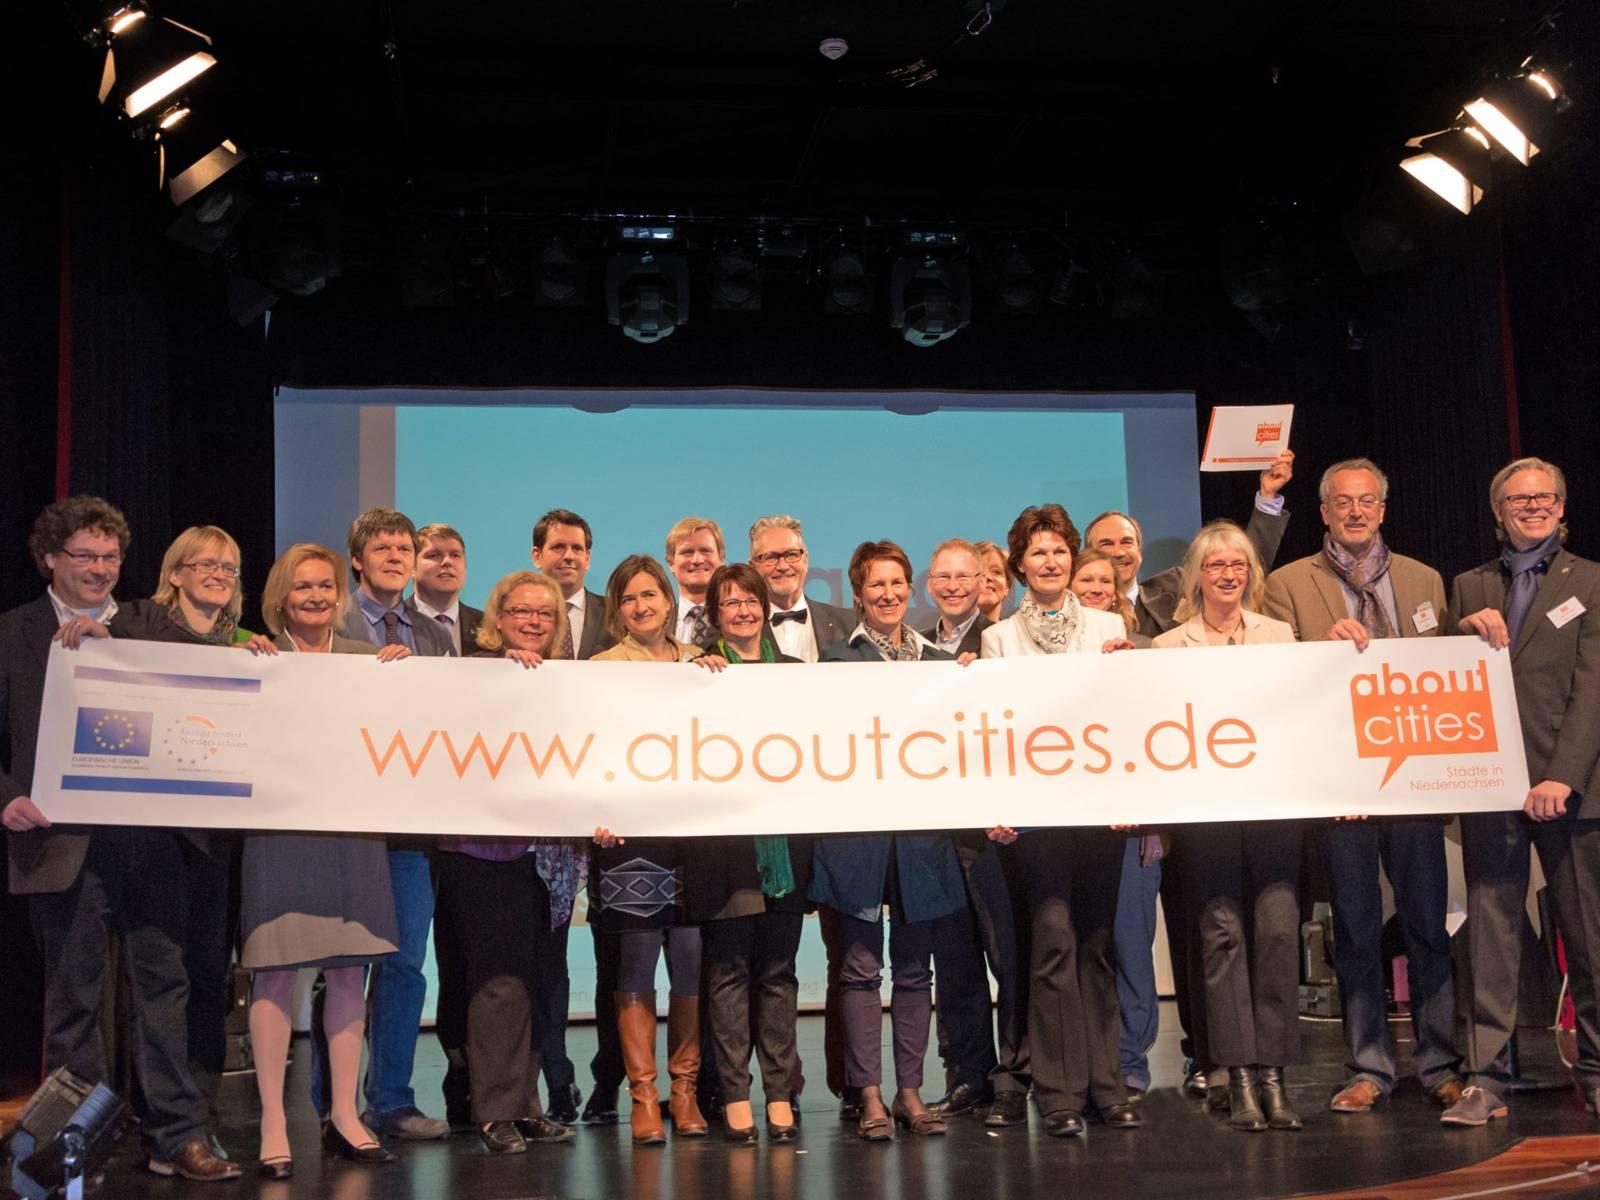 Vorstellung aboutcities.de